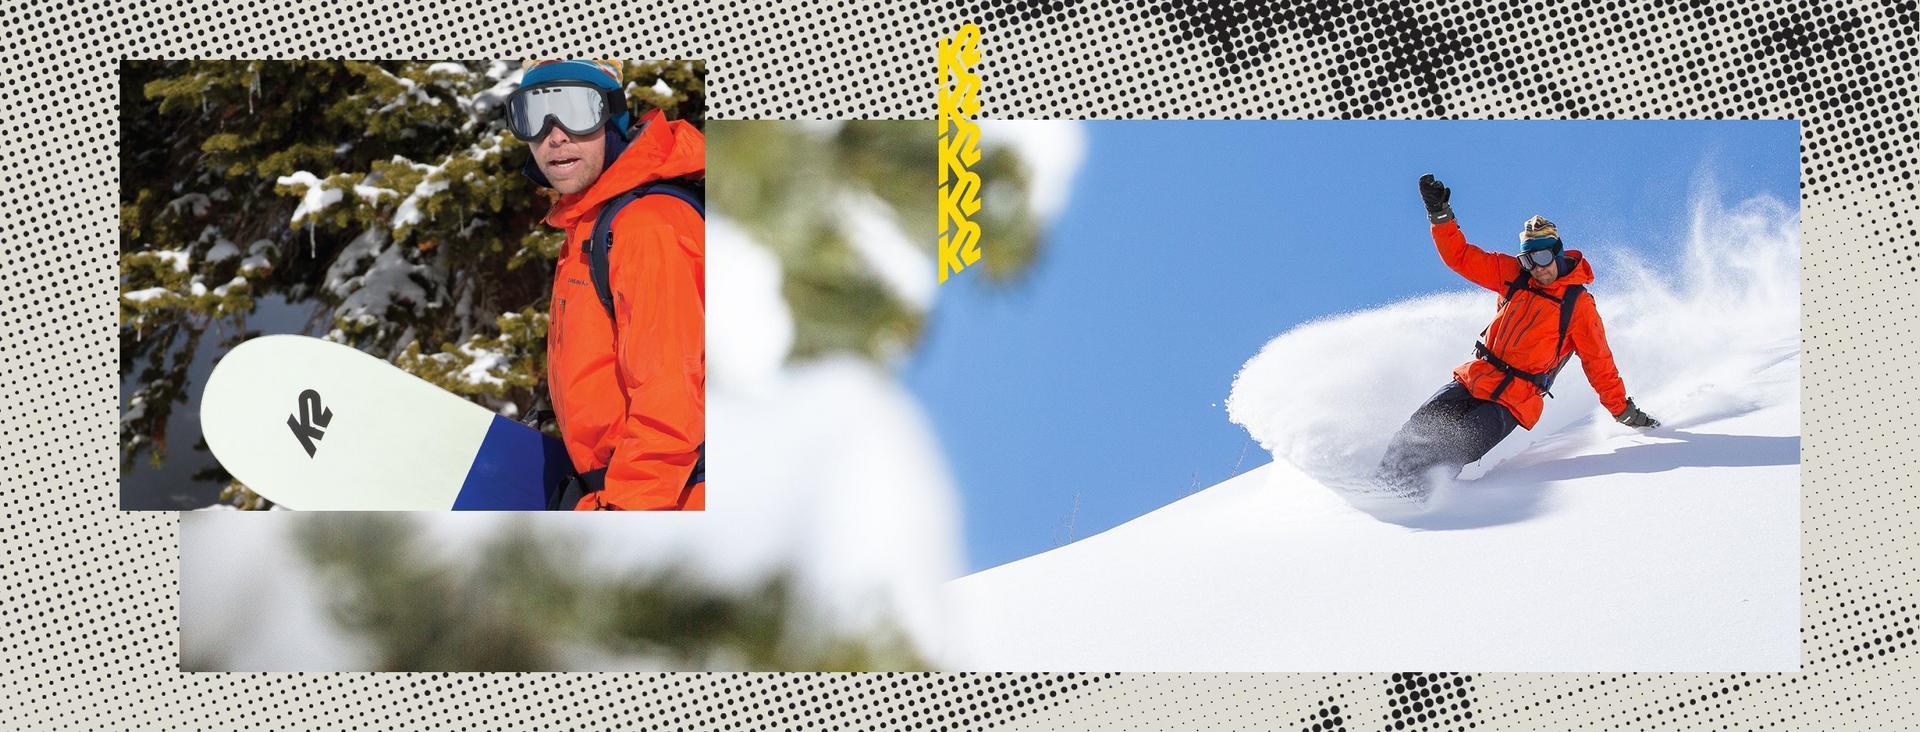 Snowboards K2 Snowboarding